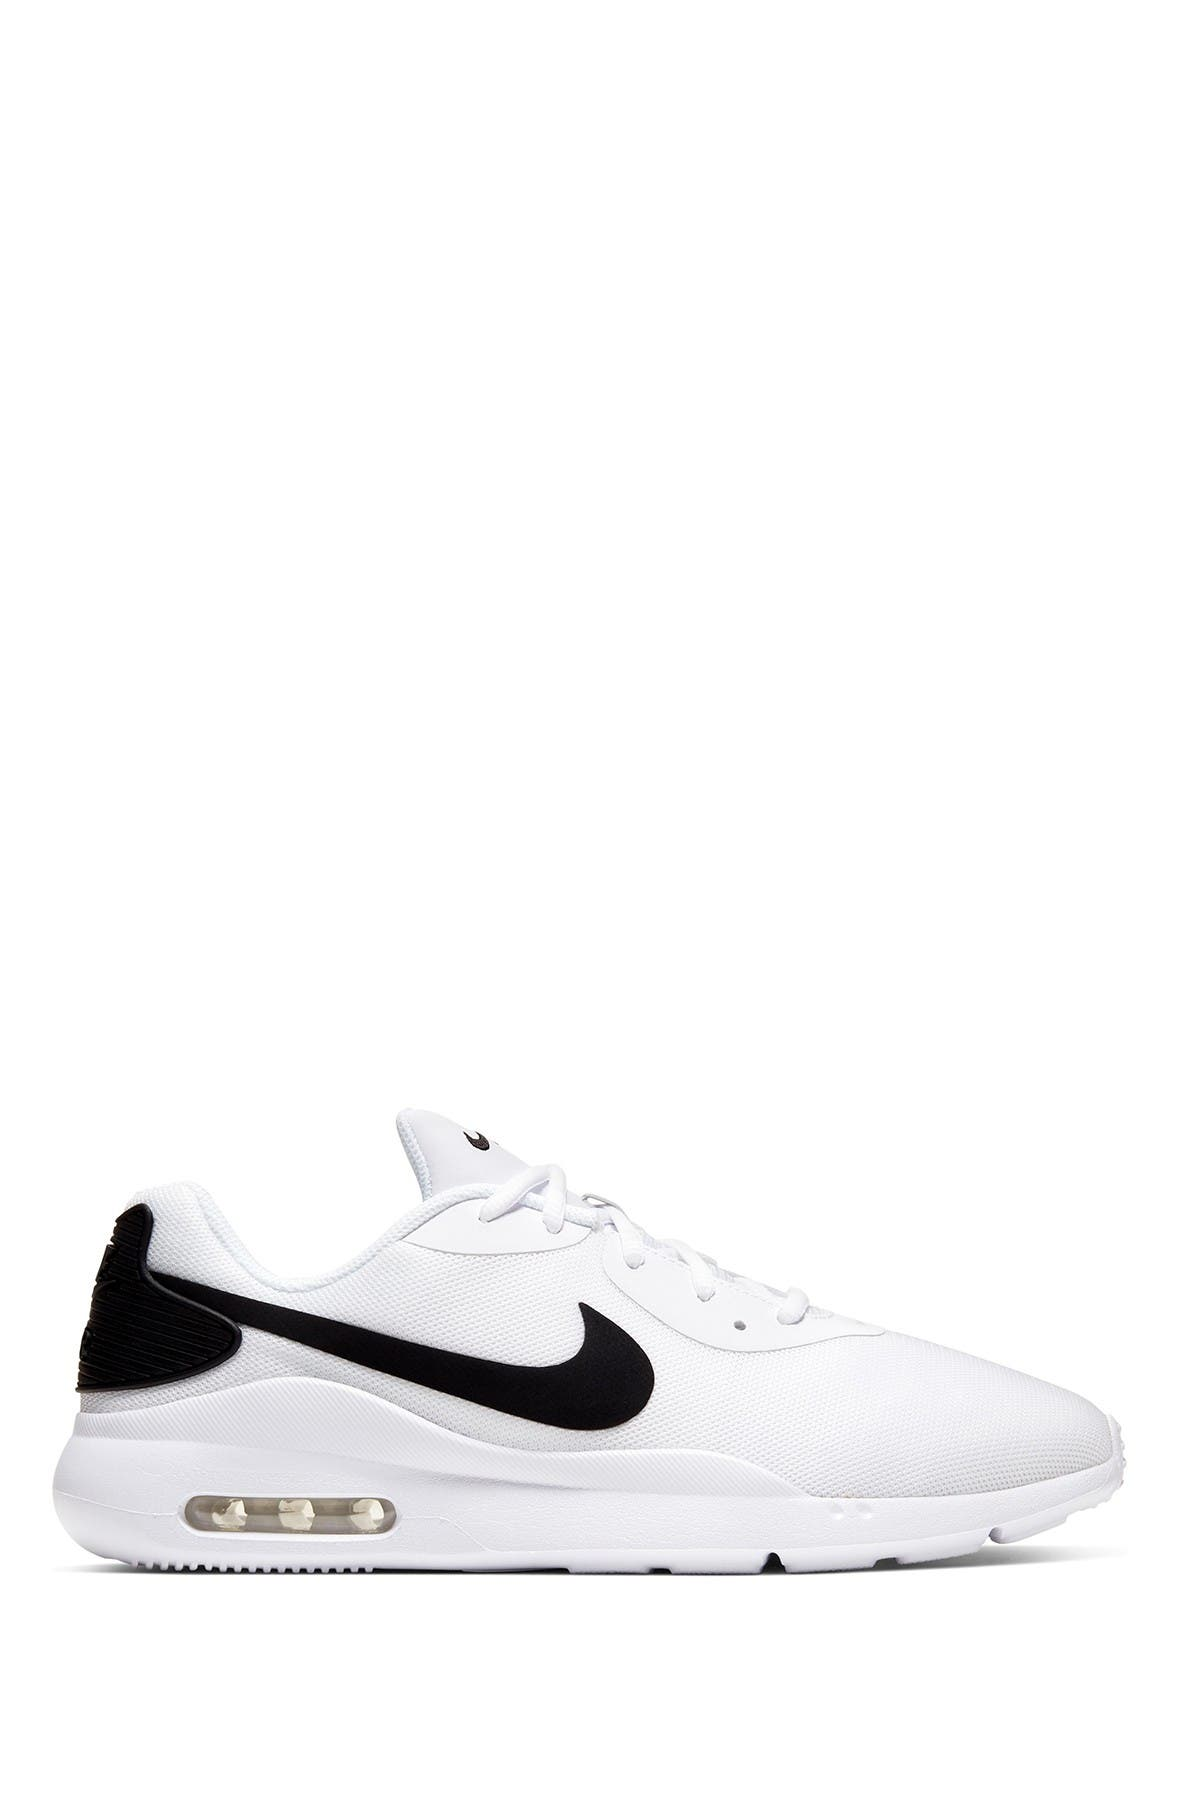 Nike | Air Max Oketo Sneaker - Extra